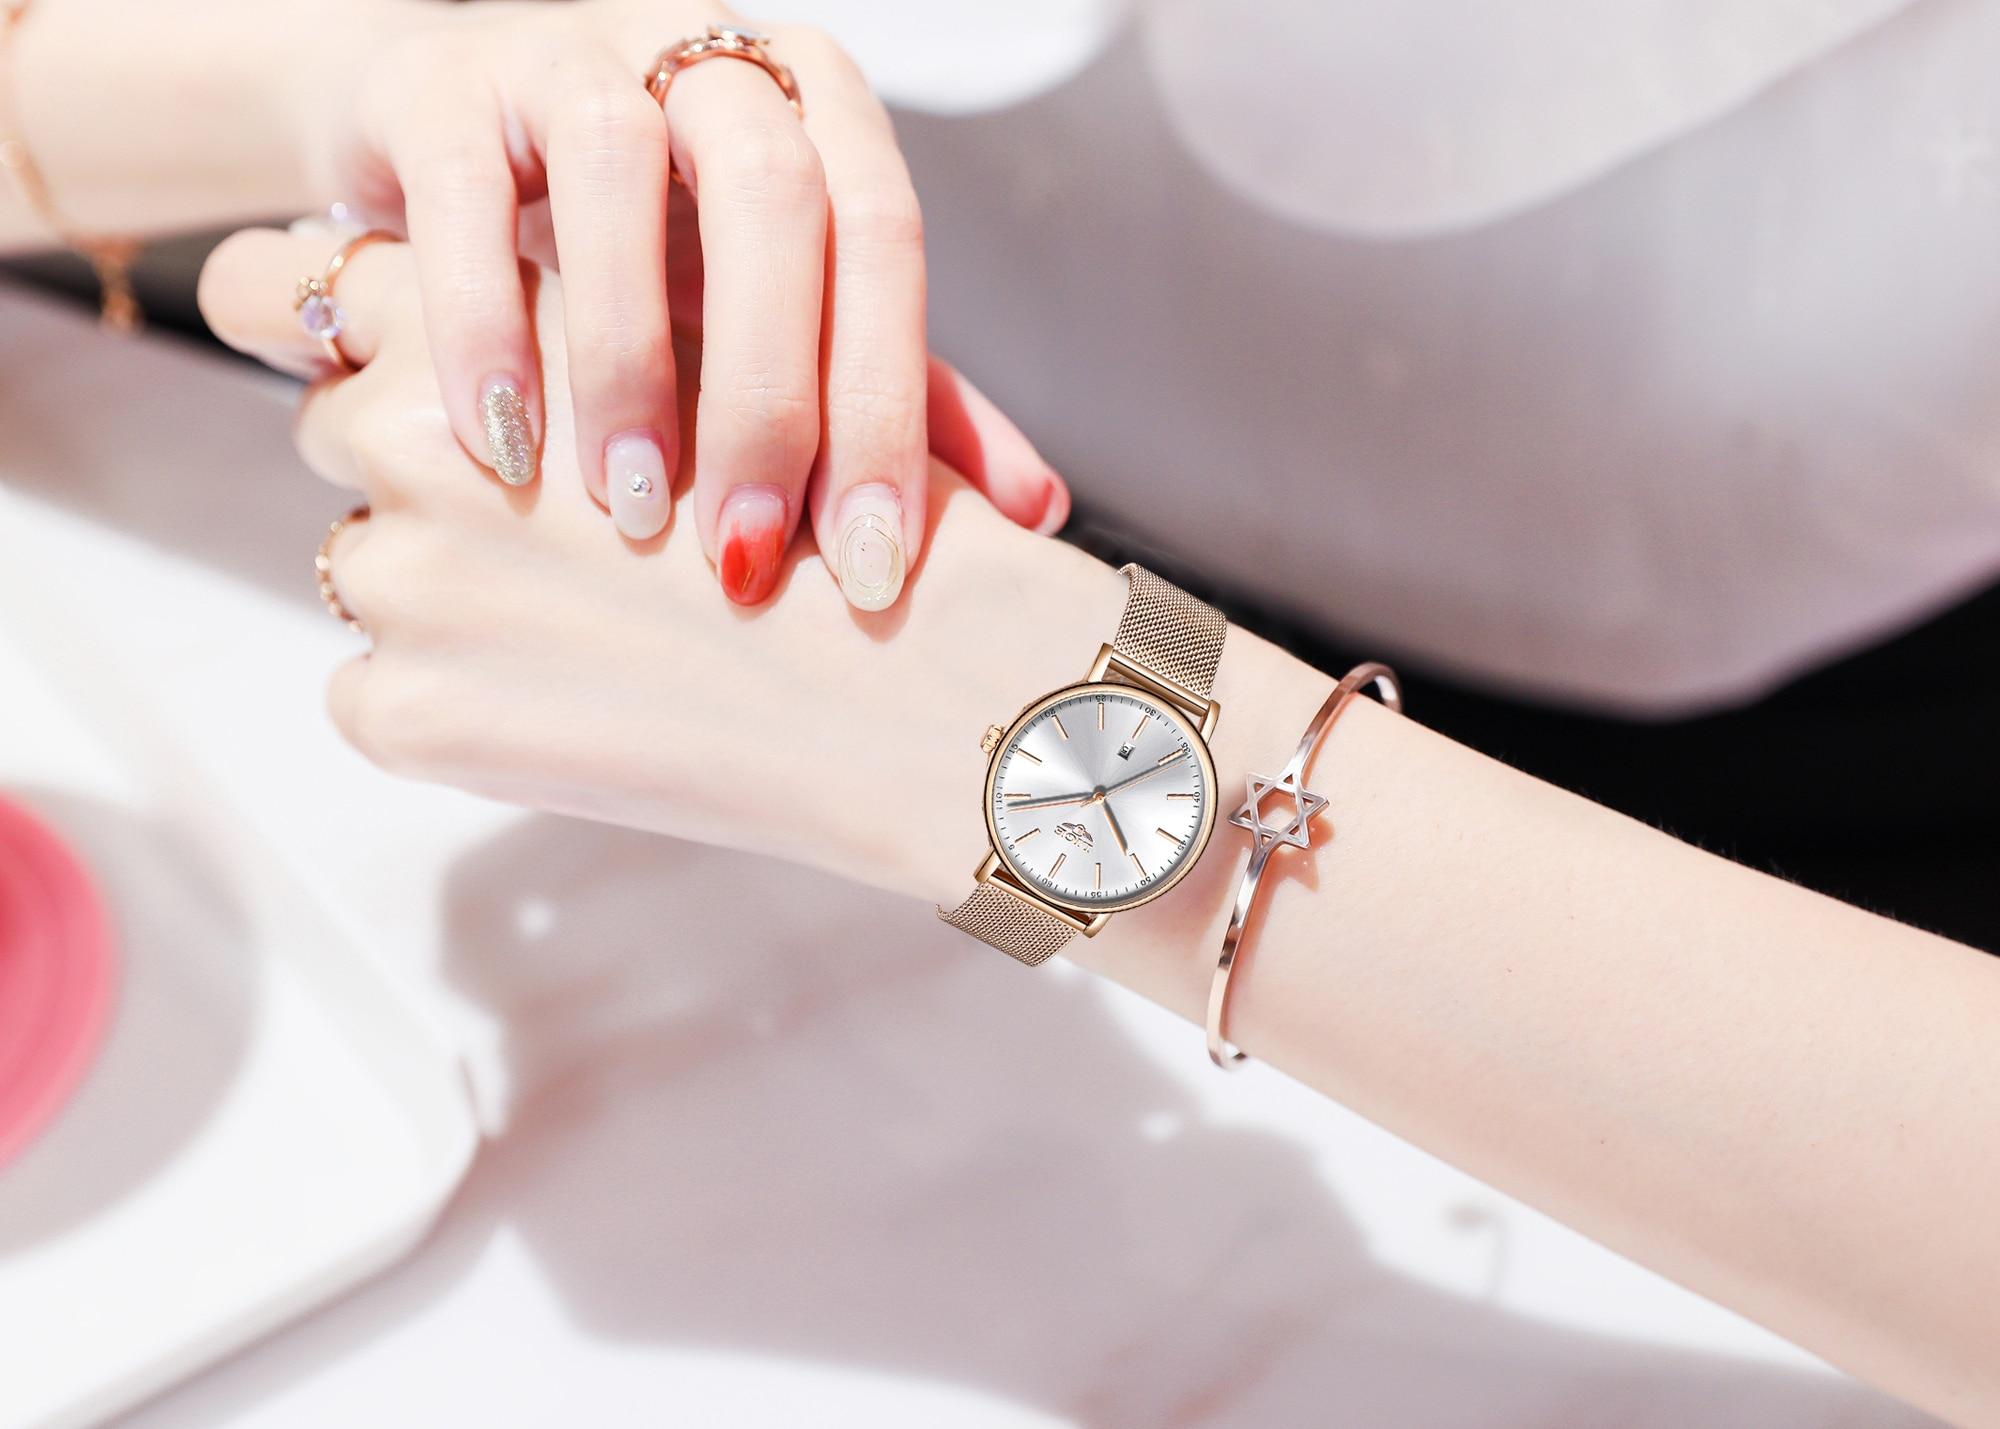 Top Brand LIGE Luxury Waterproof Watch Womens Watches  Fashion Ladies Stainless Steel Ultra-Thin Casual Wristwatch Quartz Clock enlarge